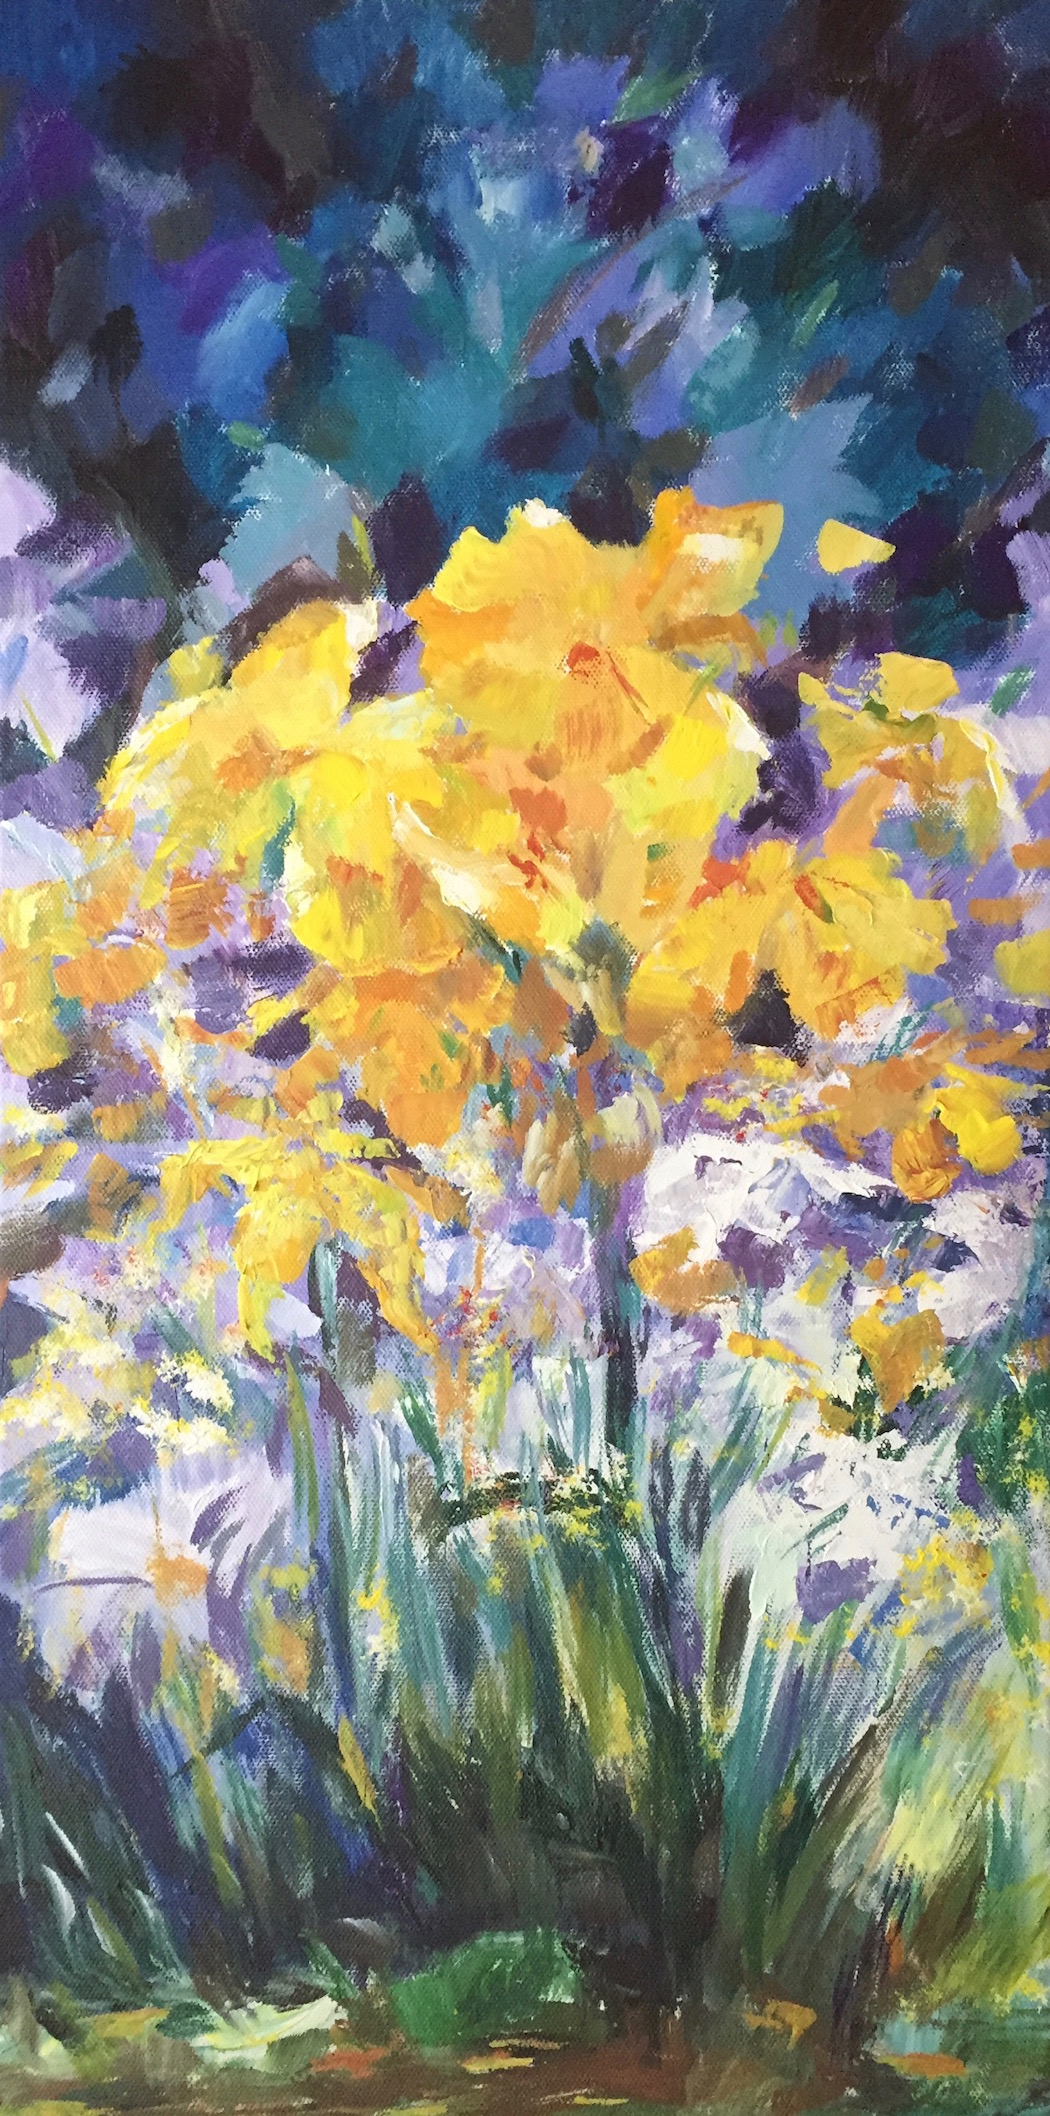 """Spring Garden"" by Cheryl Buhrman, 24x12in, acrylic on canvas (2017), $185 | BUY NOW"